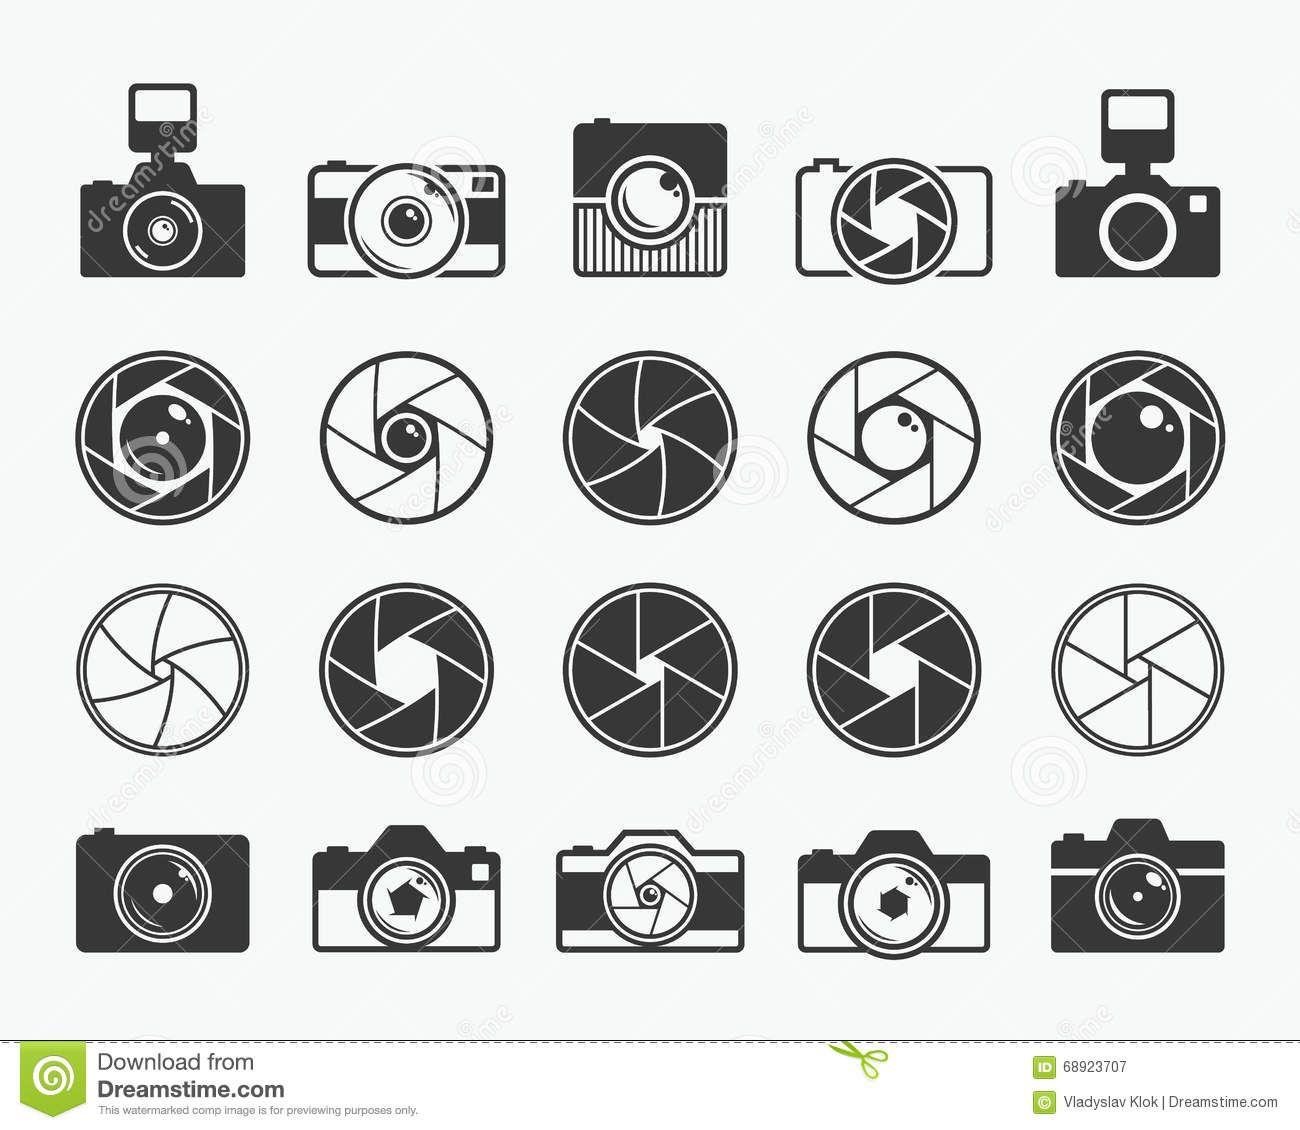 Camera Shutter Lenses And Photo Camera Icons Stock Vector Illustration Of Element Pictogram 68923707 Camera Icon Camera Tattoos Camera Art